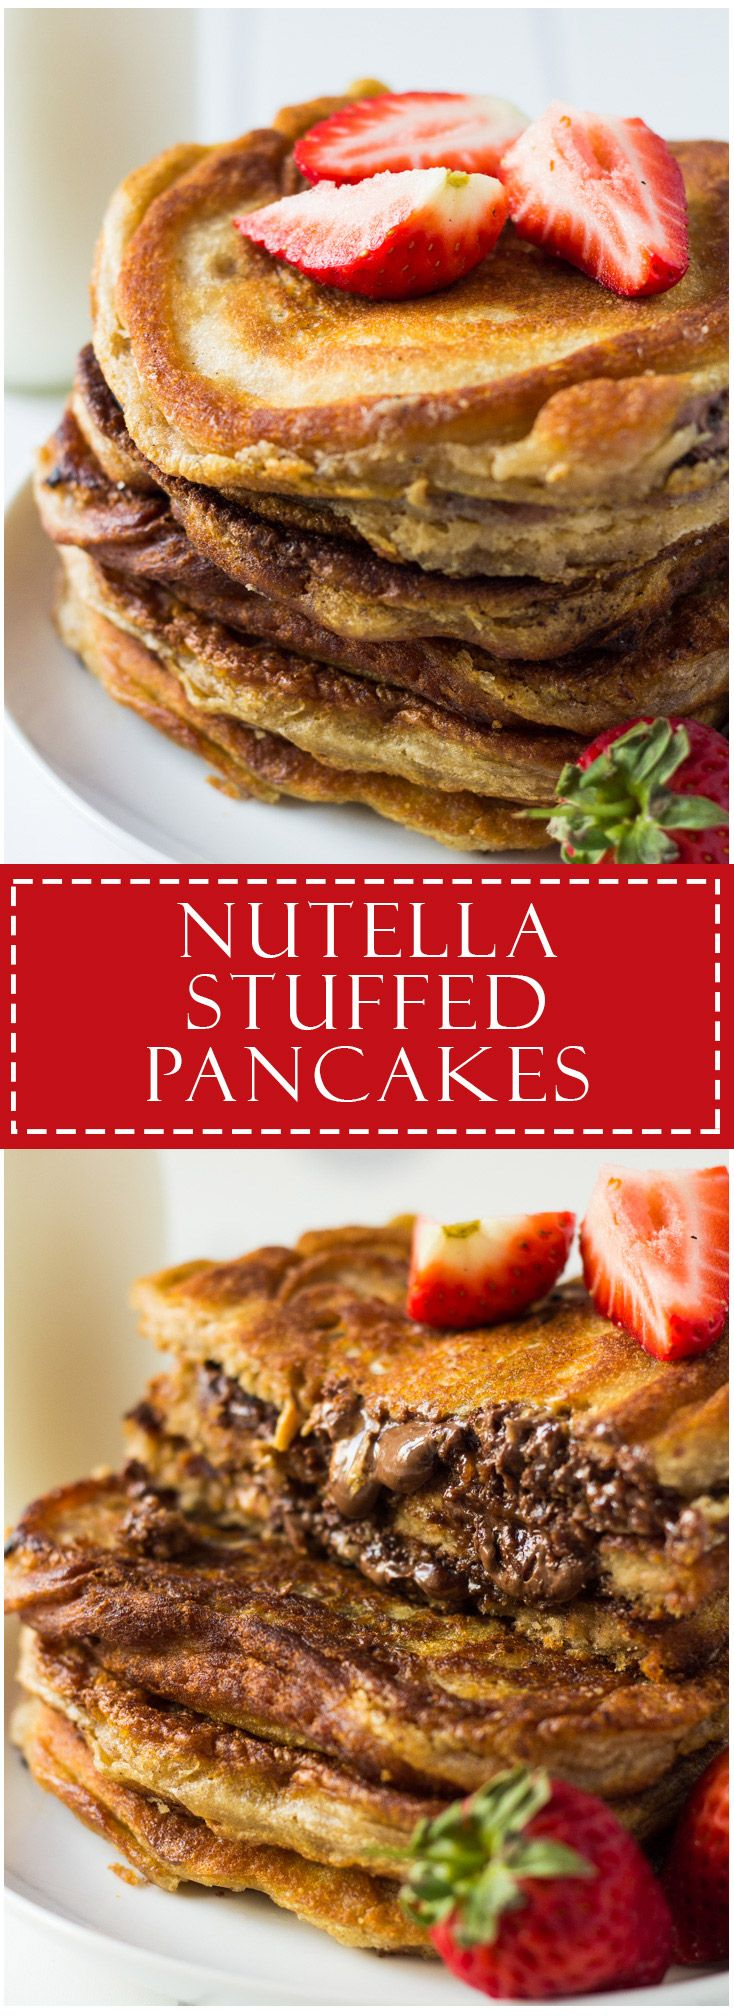 Nutella Stuffed Pancakes | Marsha's Baking Addiction